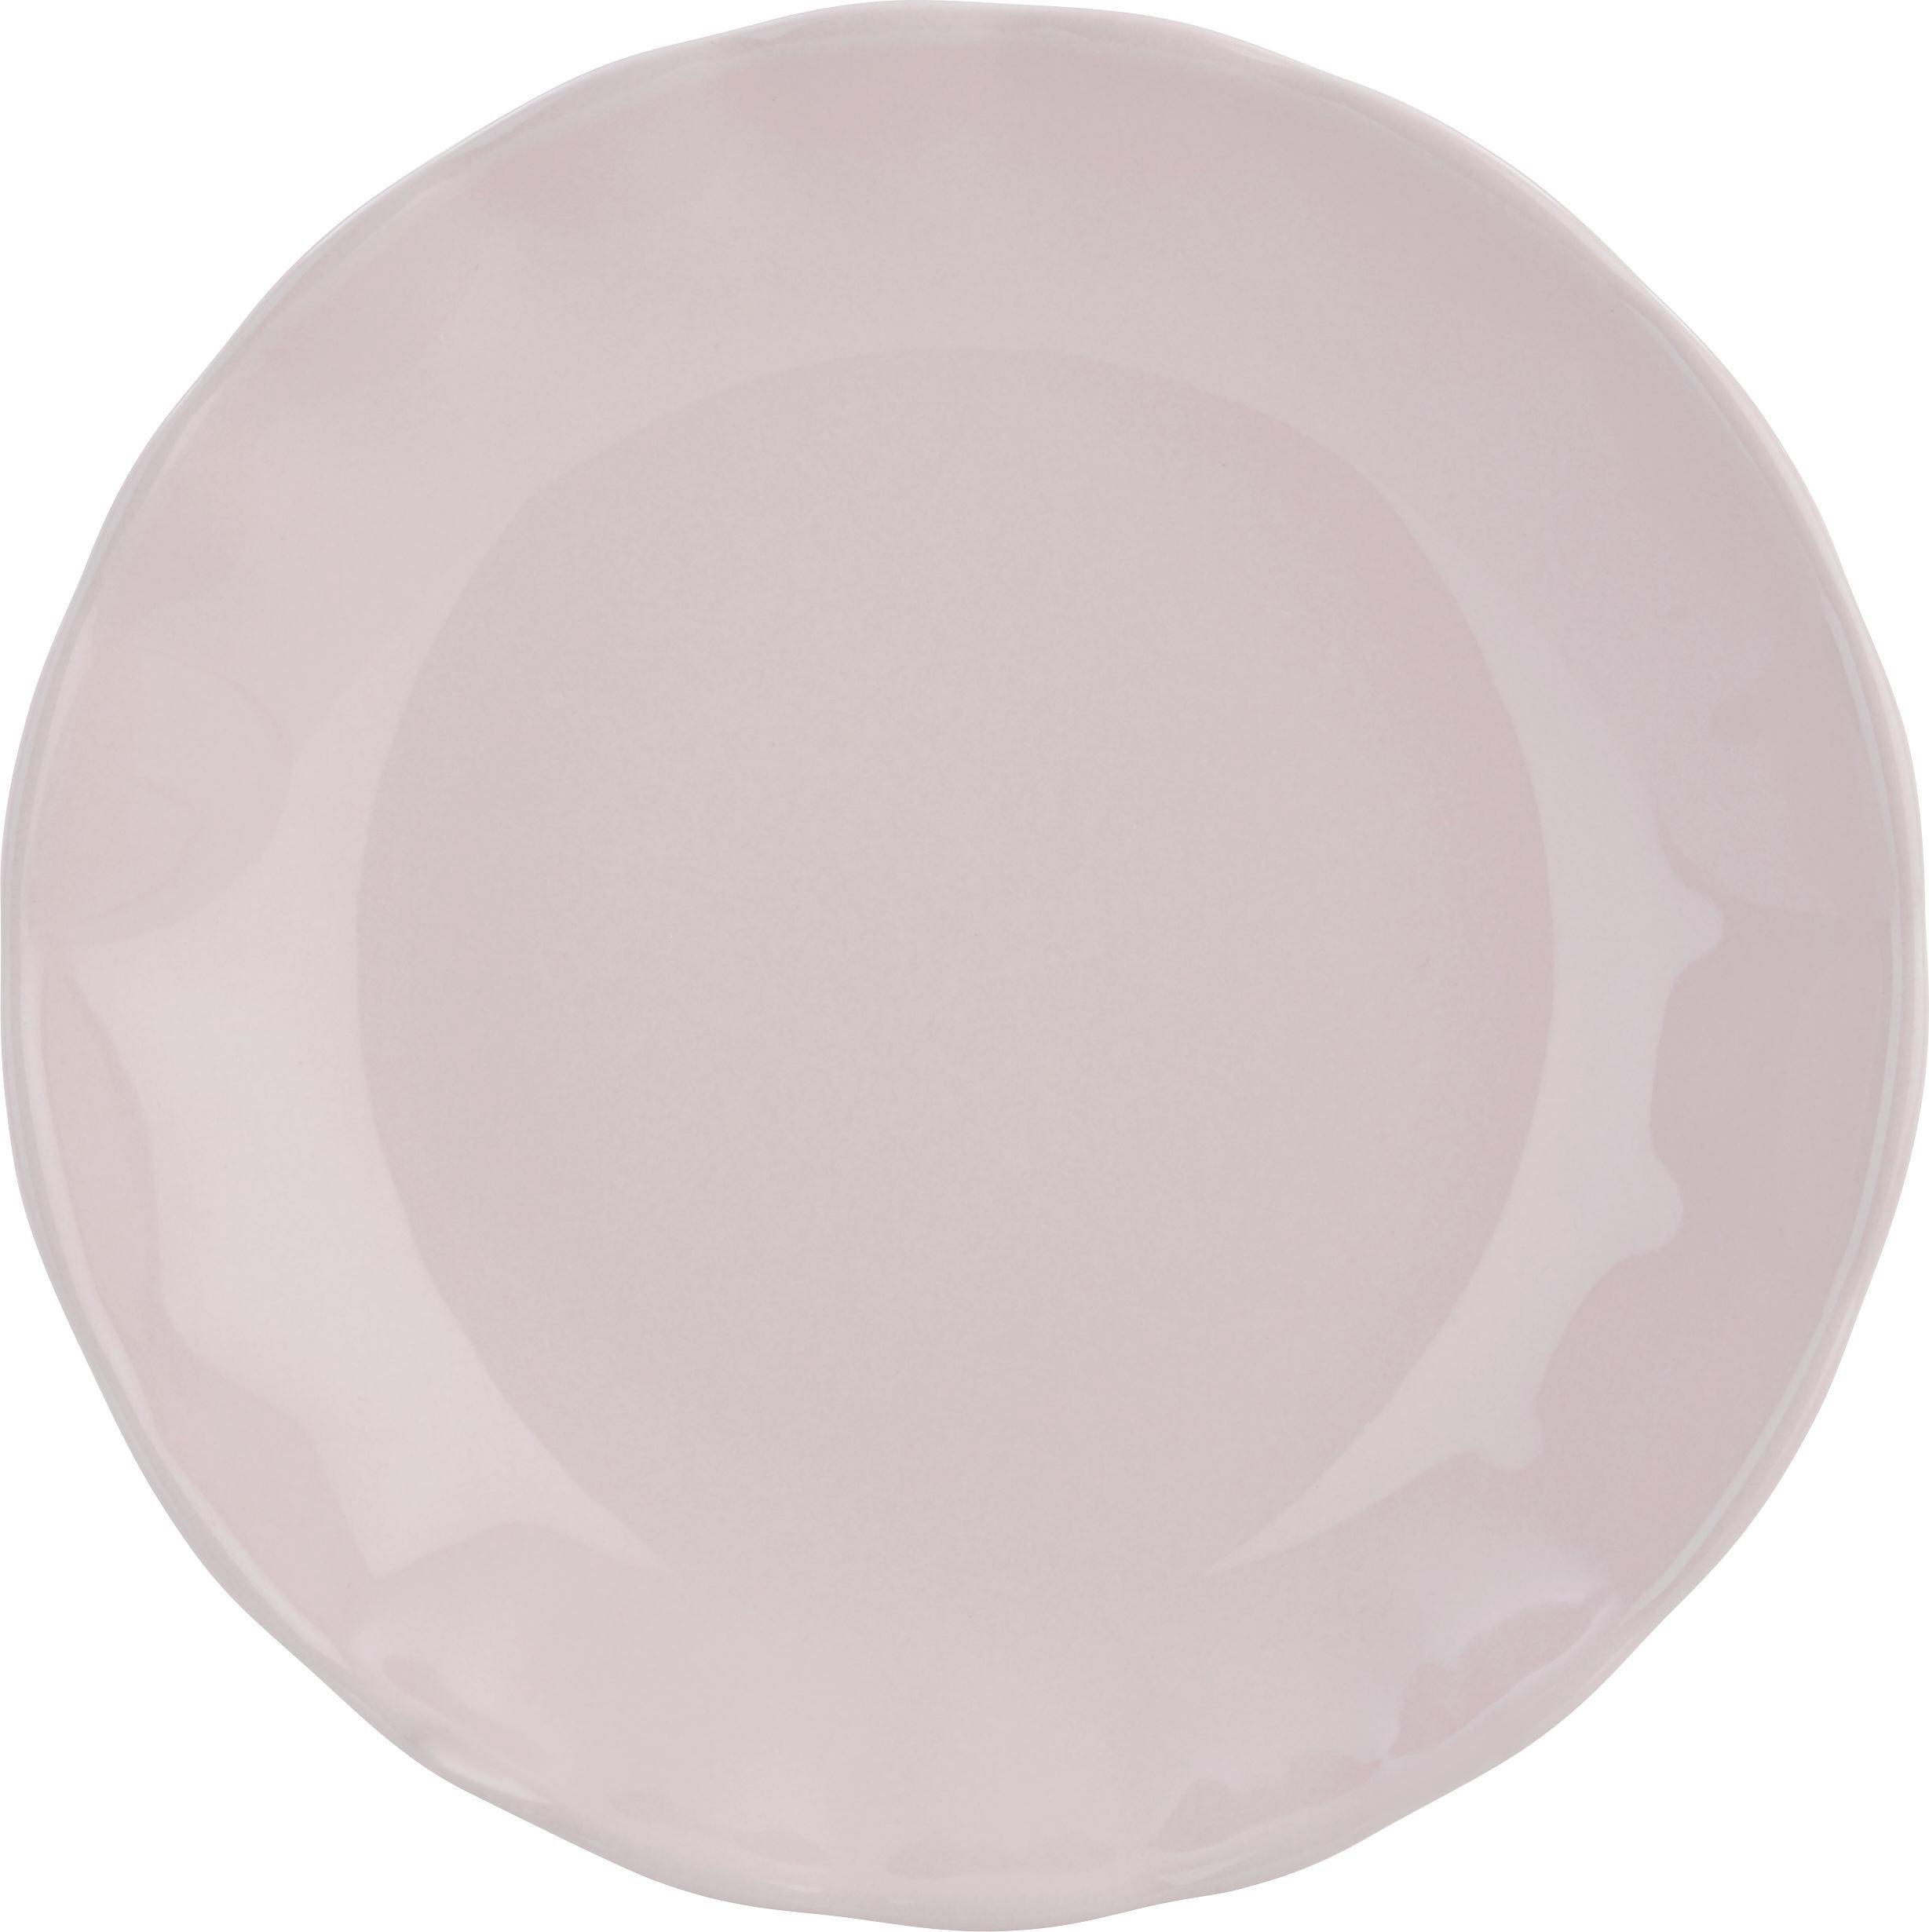 Globoki Krožnik Pauline - roza, Romantika, keramika (25cm) - ZANDIARA